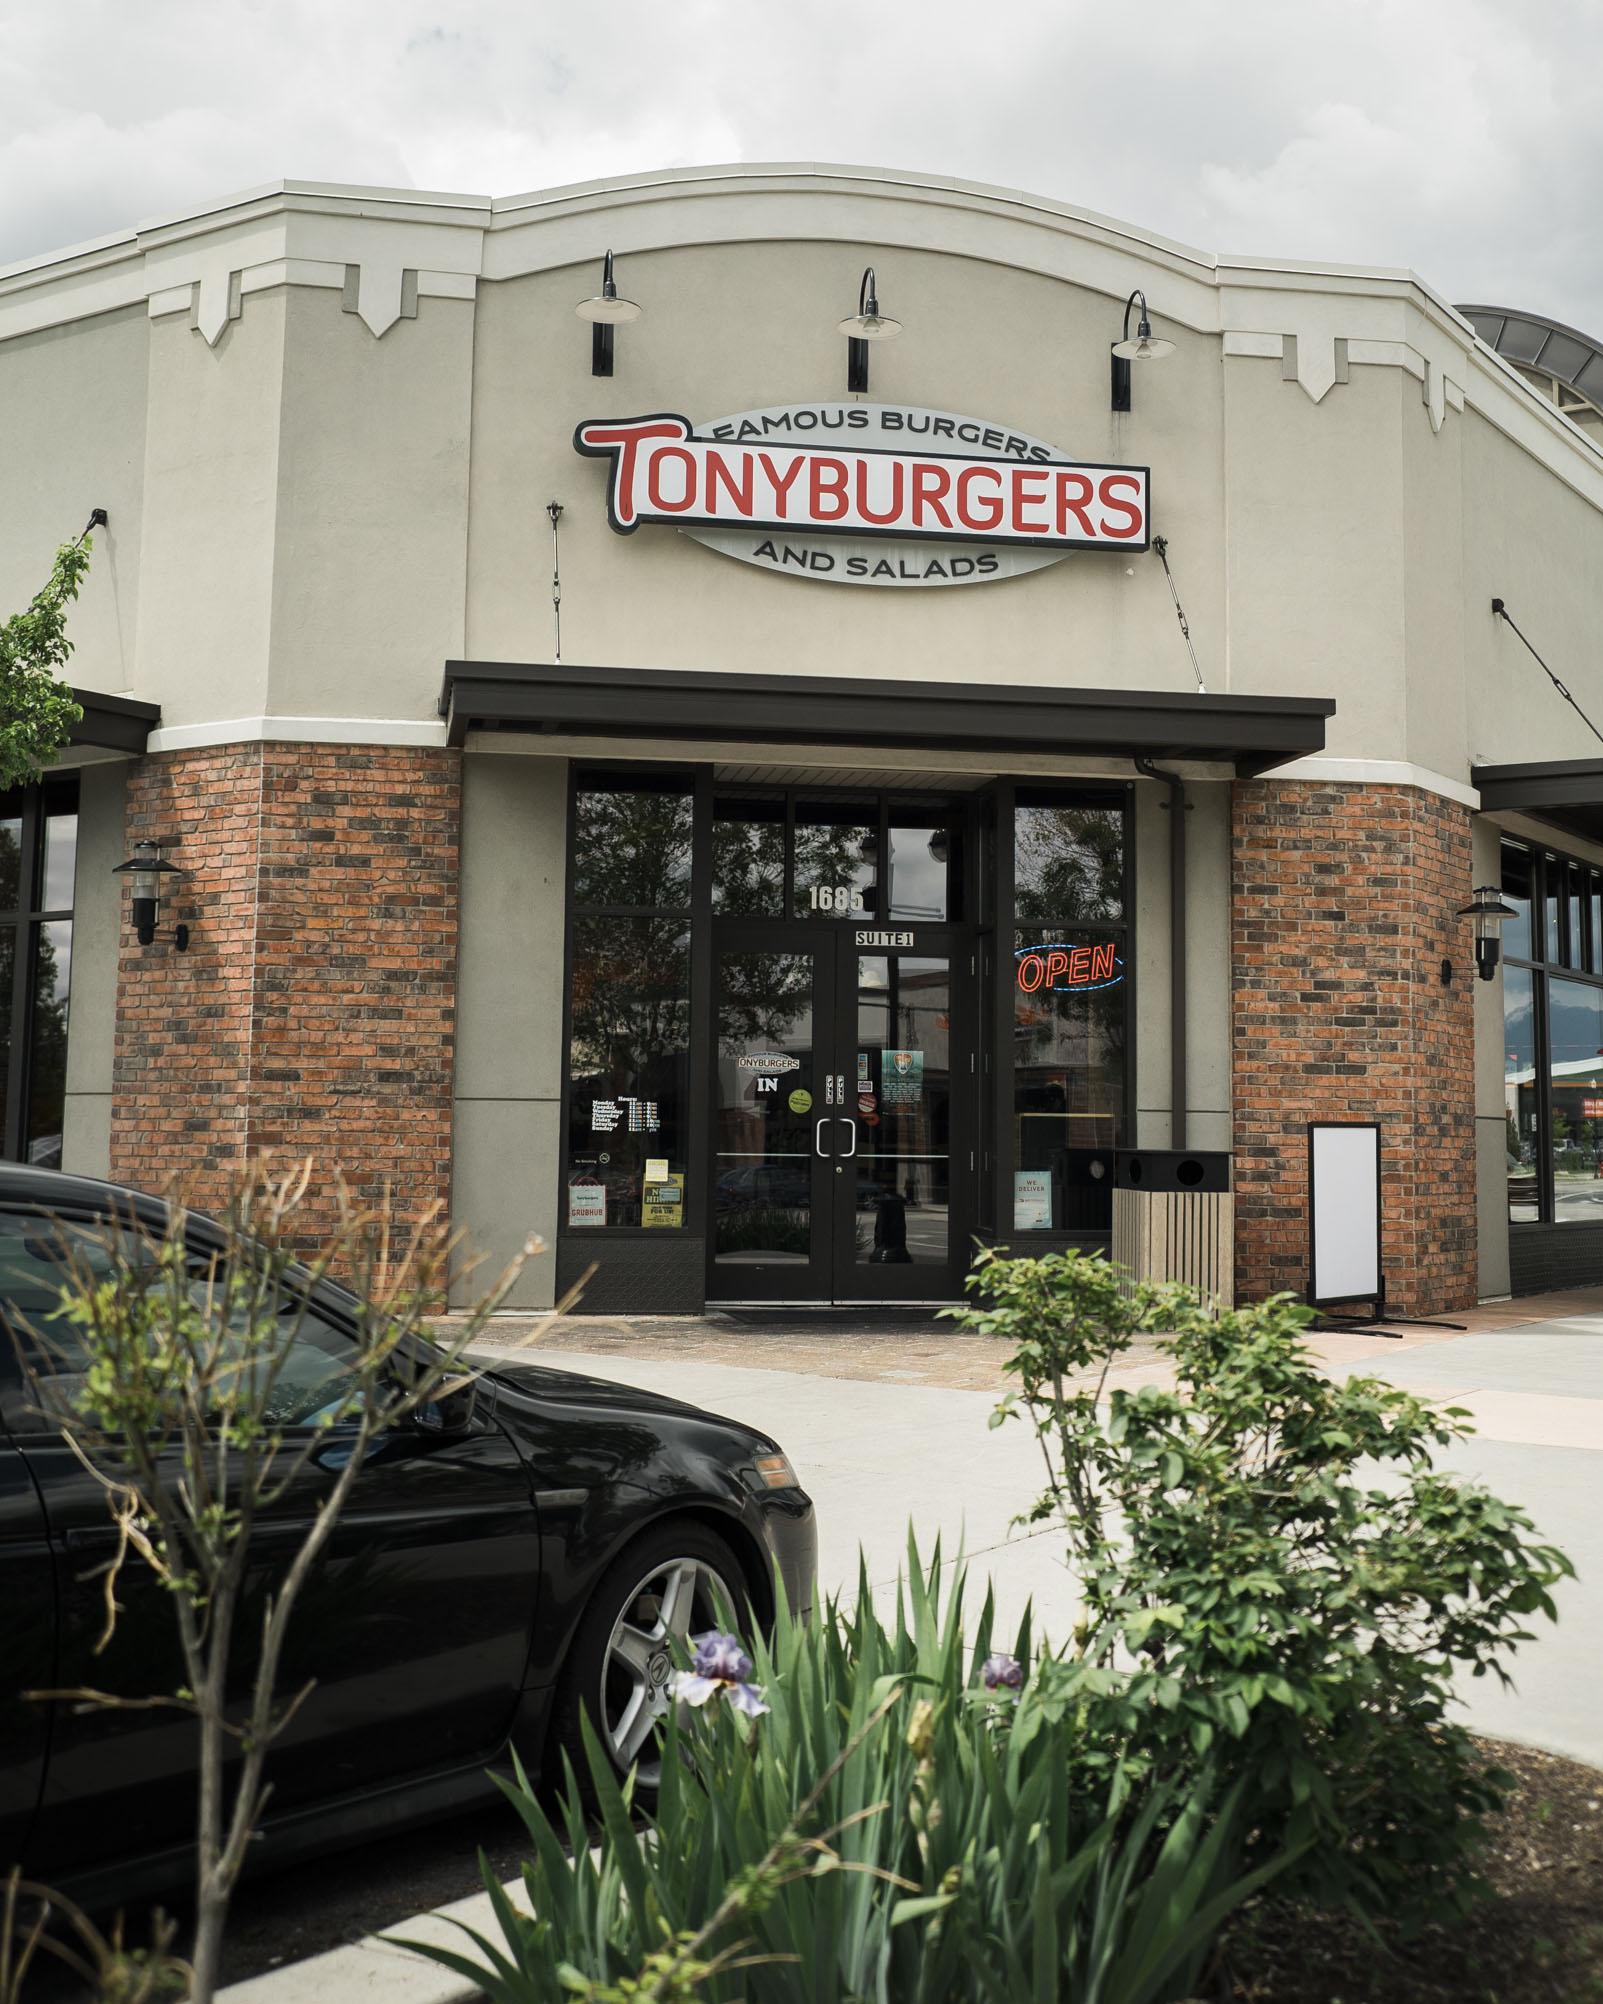 tonyburgers-big-american-story-00908.jpg